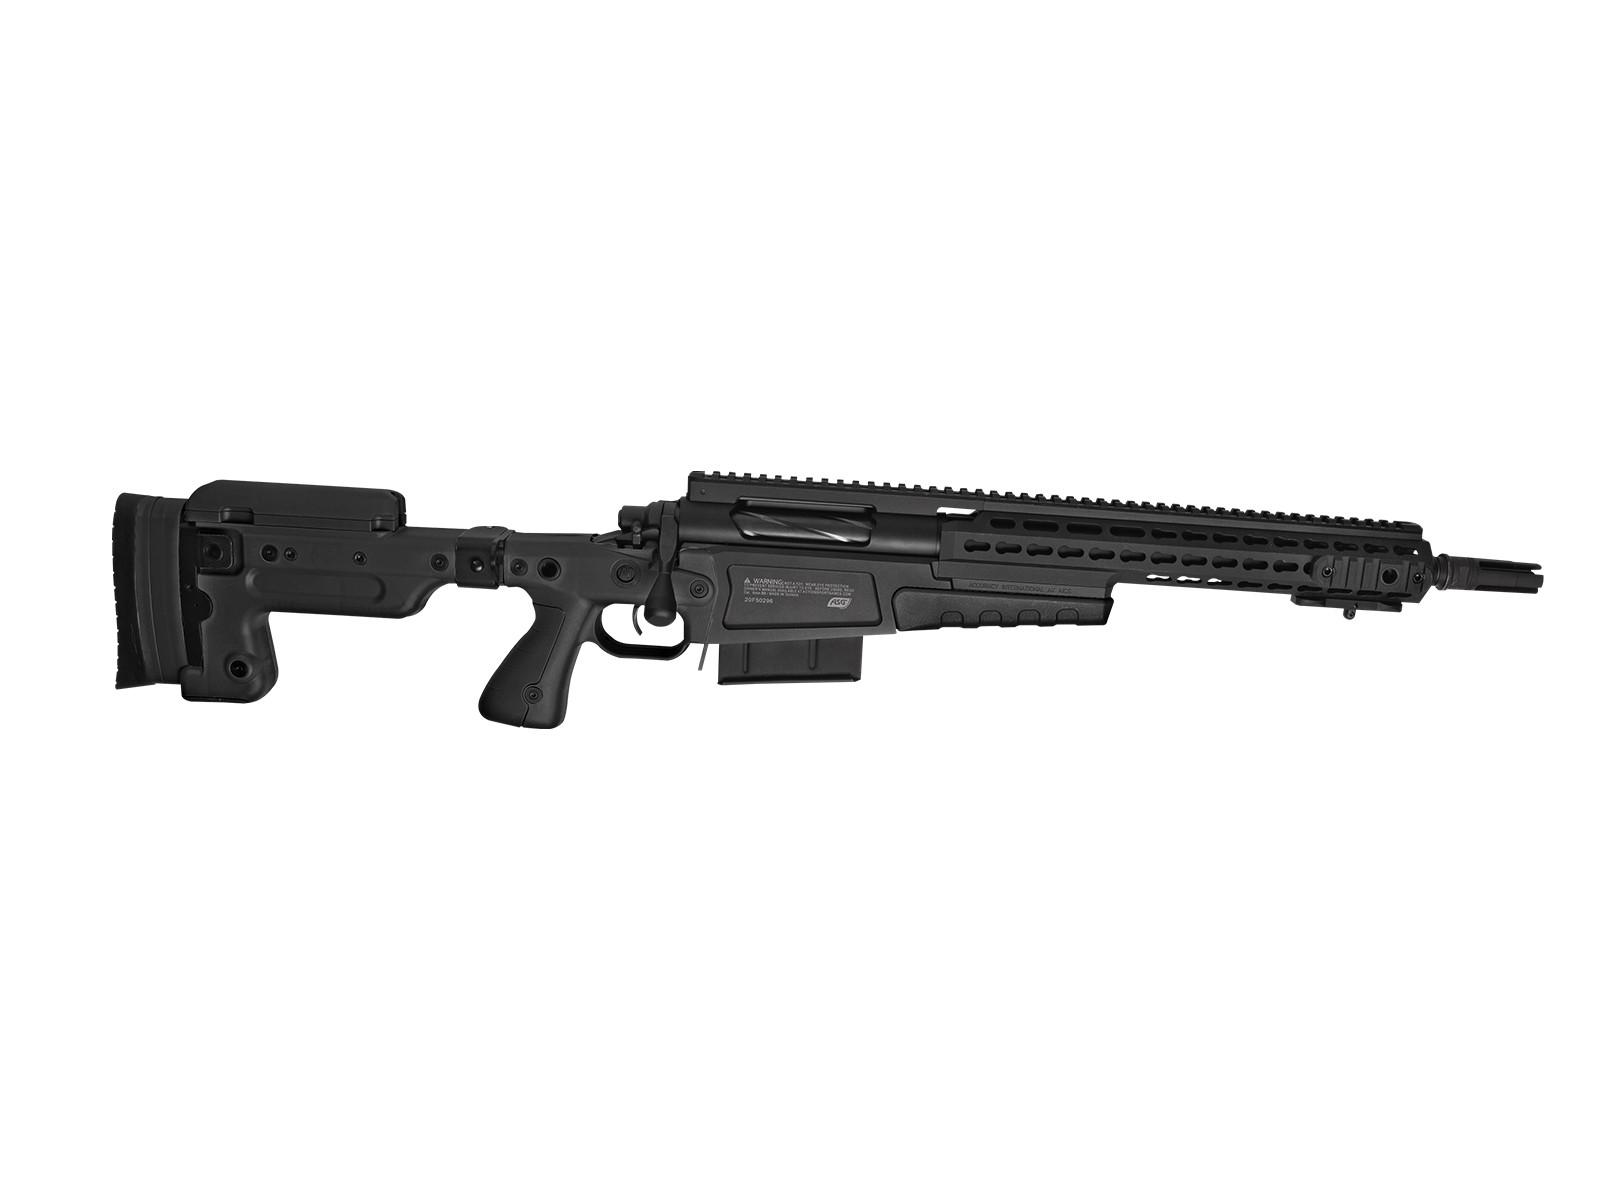 ASG - Fusil de Sniper AI MK13 Compact - Spring - Noir (2 Joules)